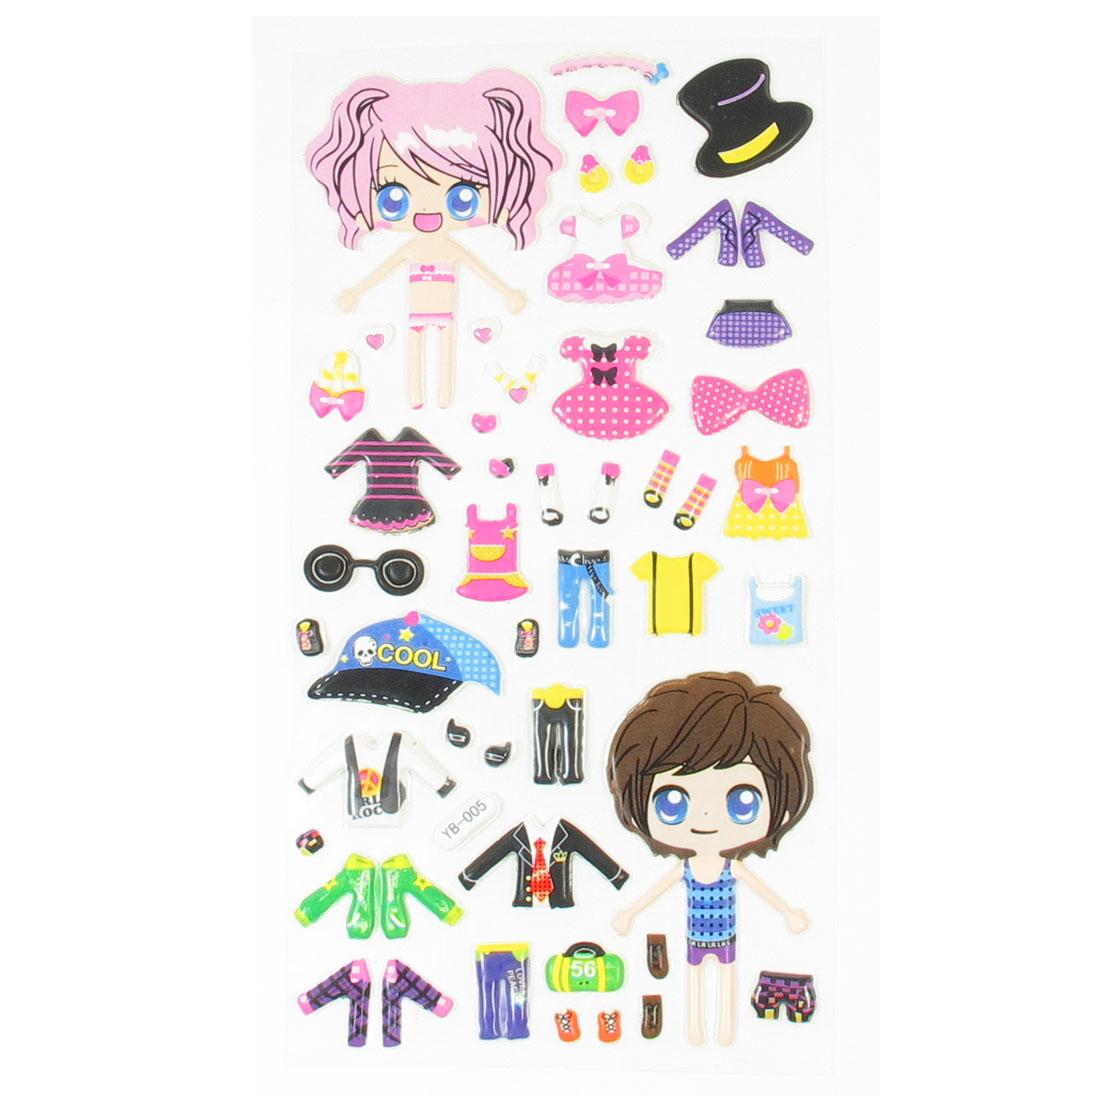 Girls Dress Up Dolls 3D DIY Crafts Sponge Puffy Sticker Decor Colorful